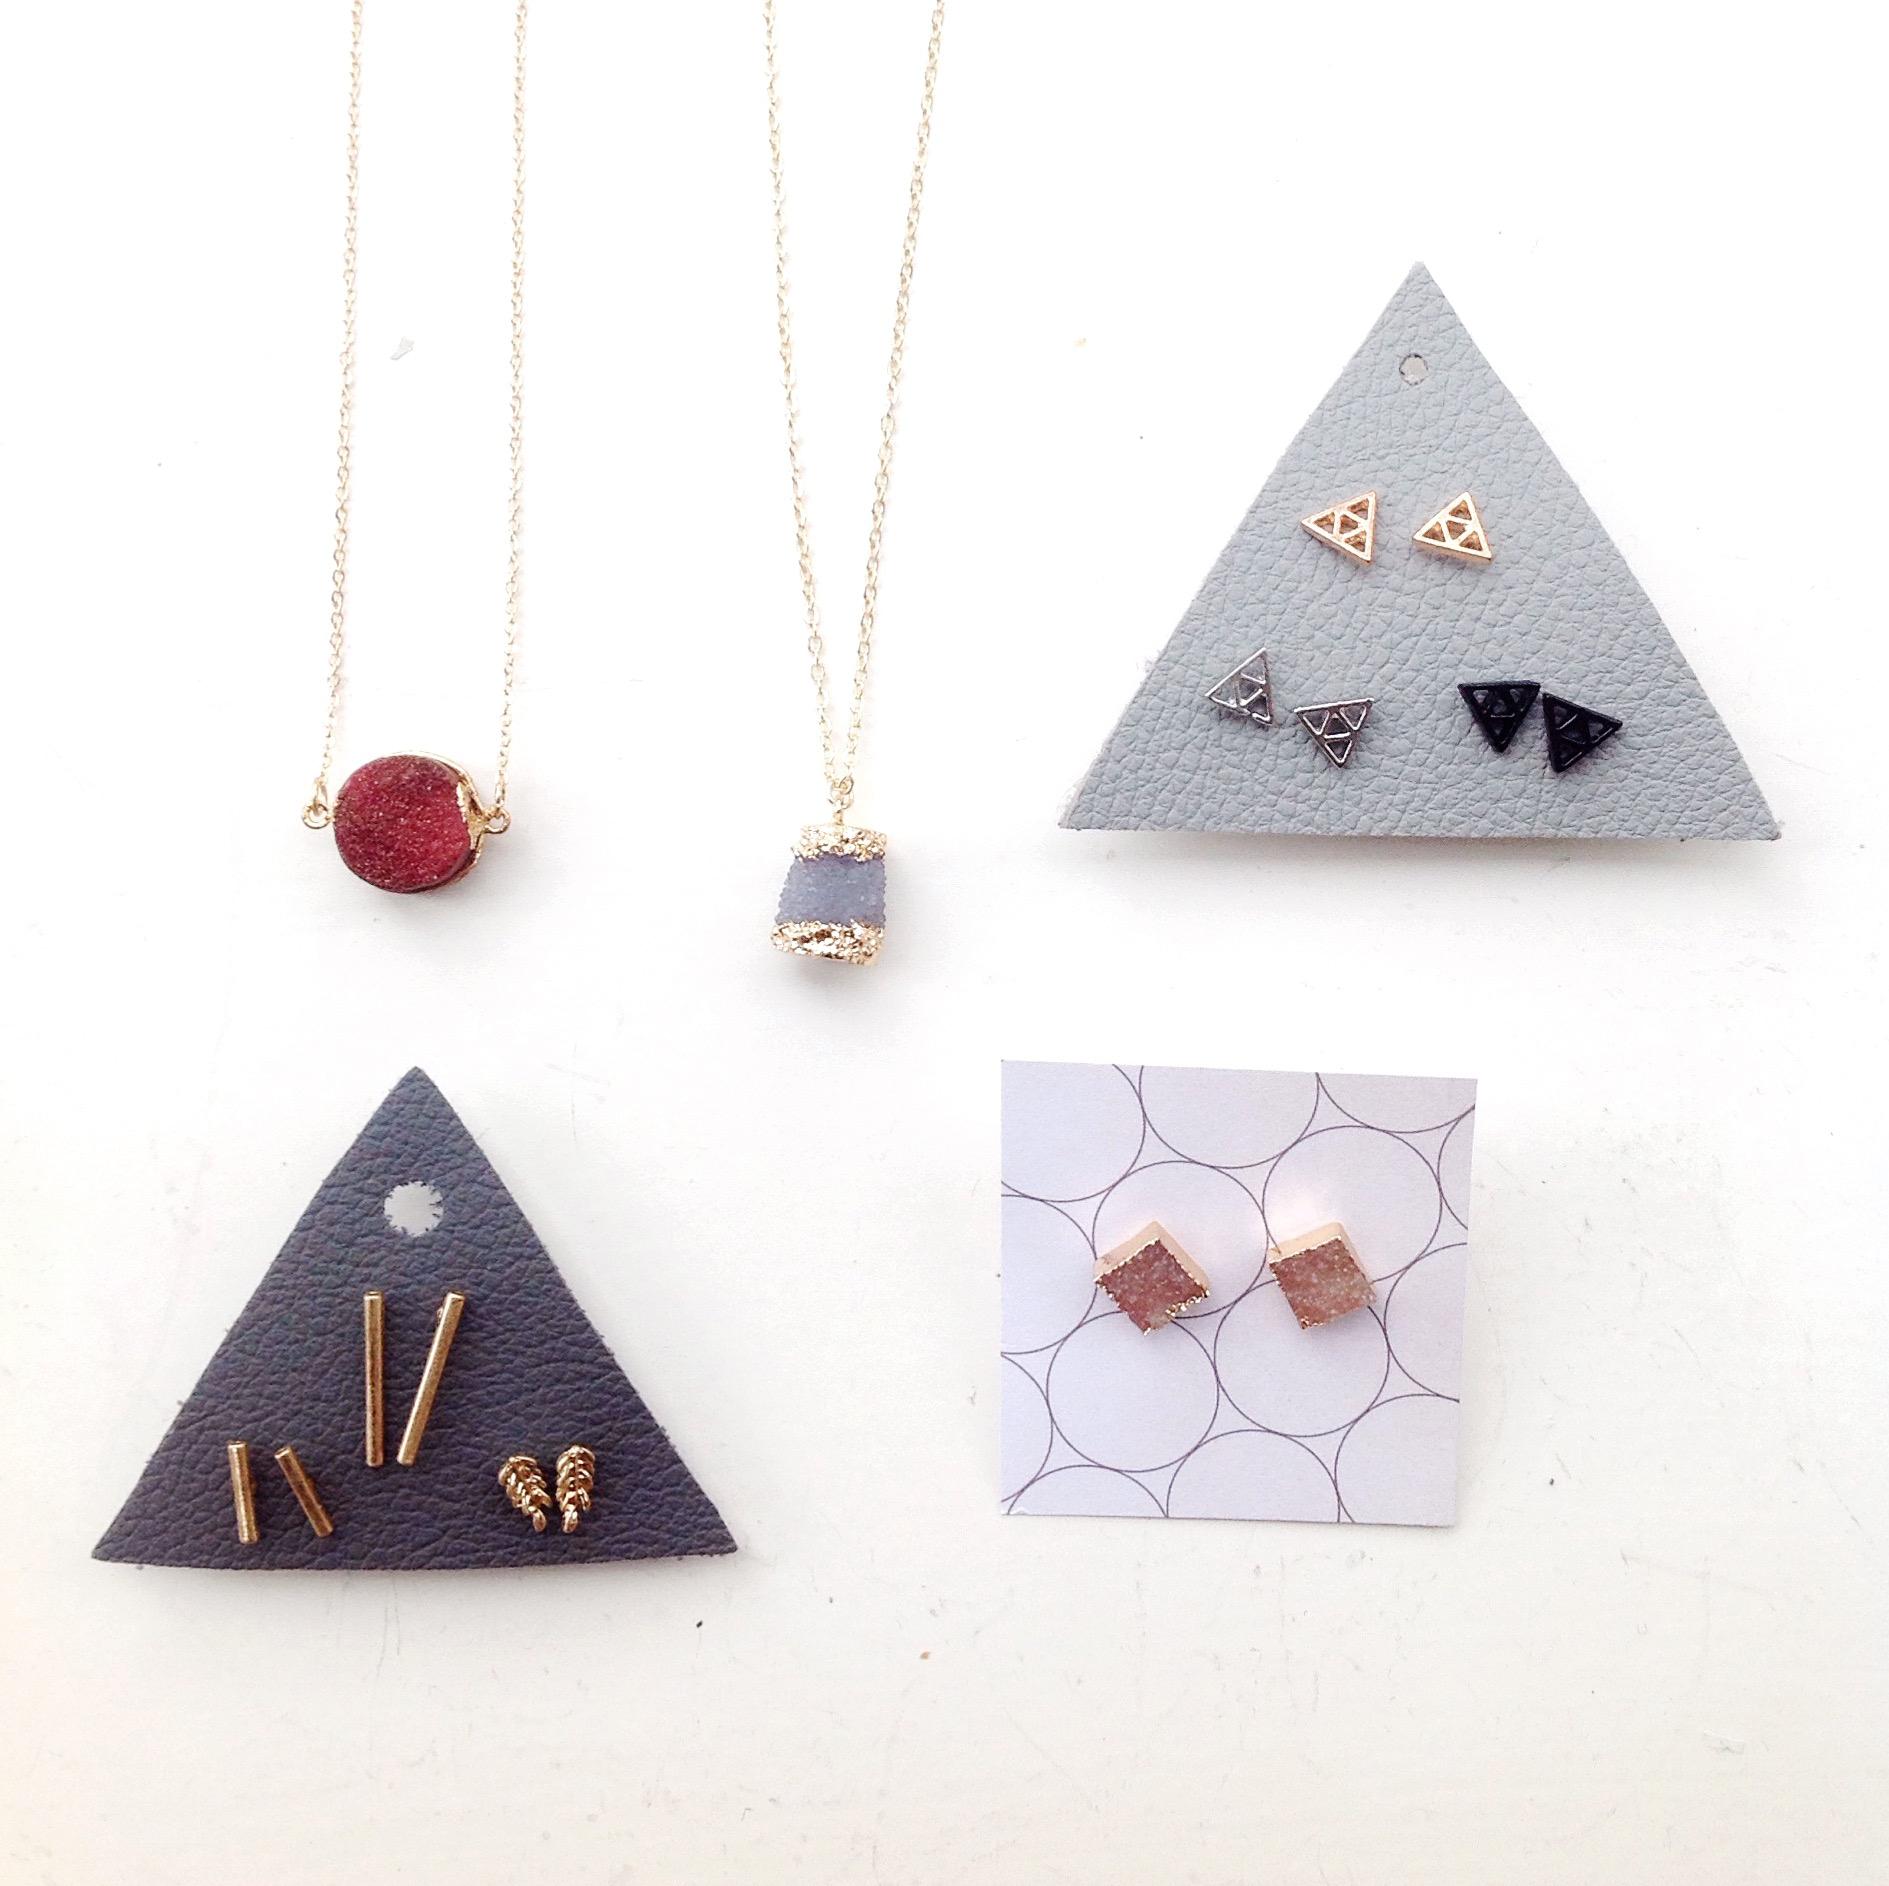 Druzi jewelry and earring trios, $8-$16